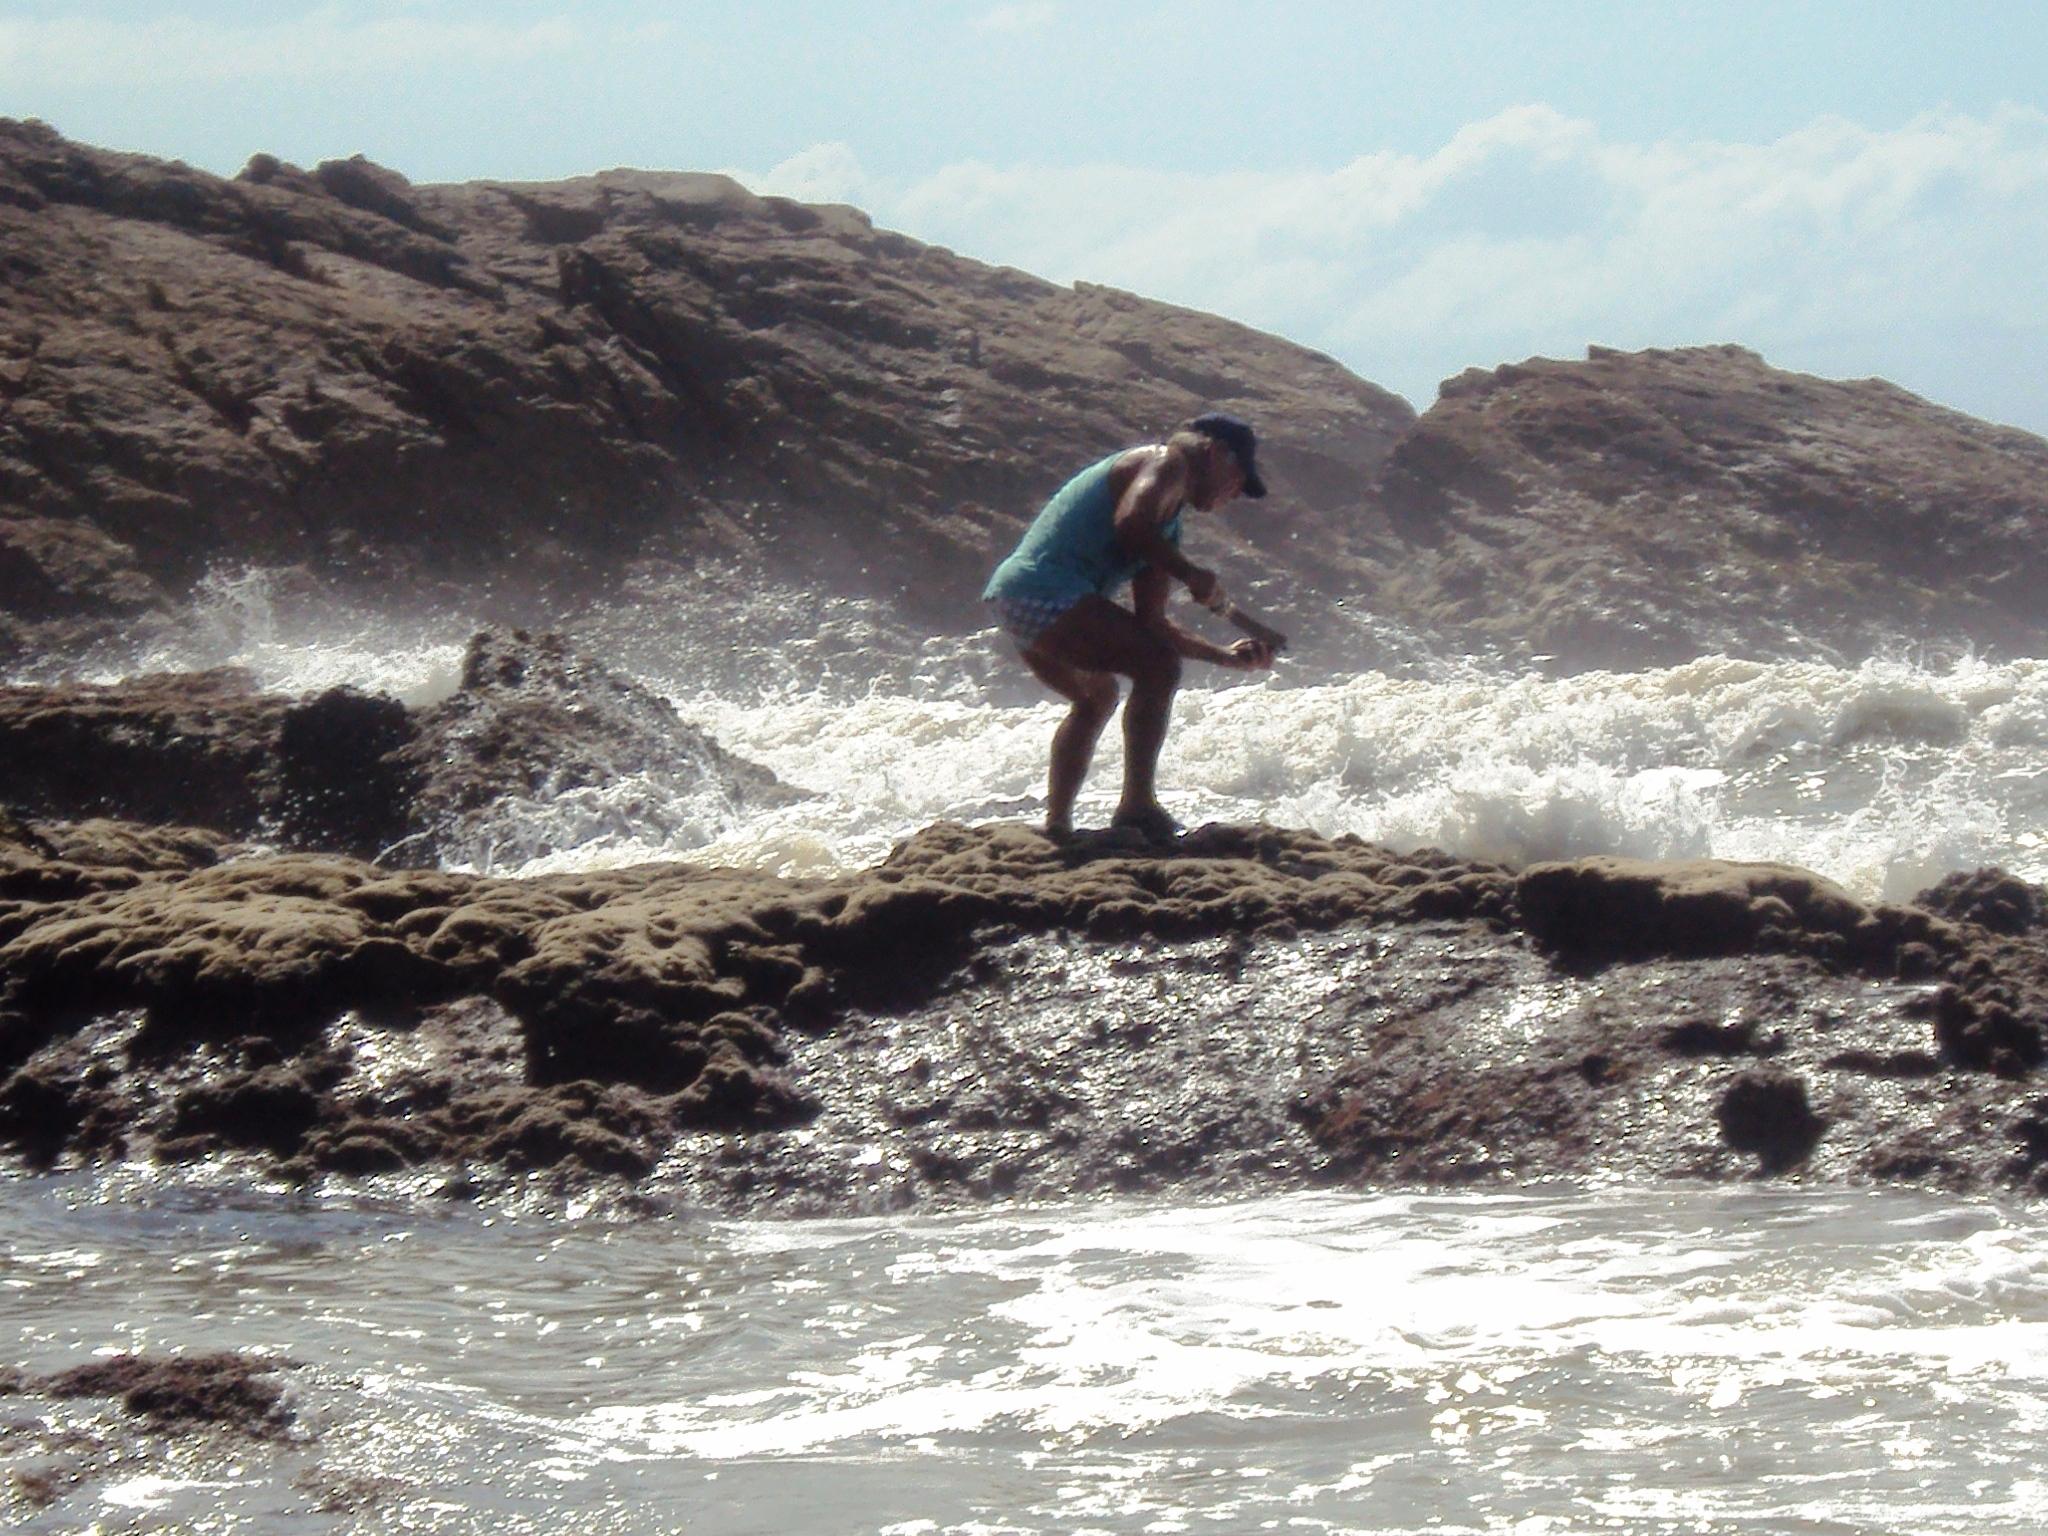 ilha do mel - catador de marisco